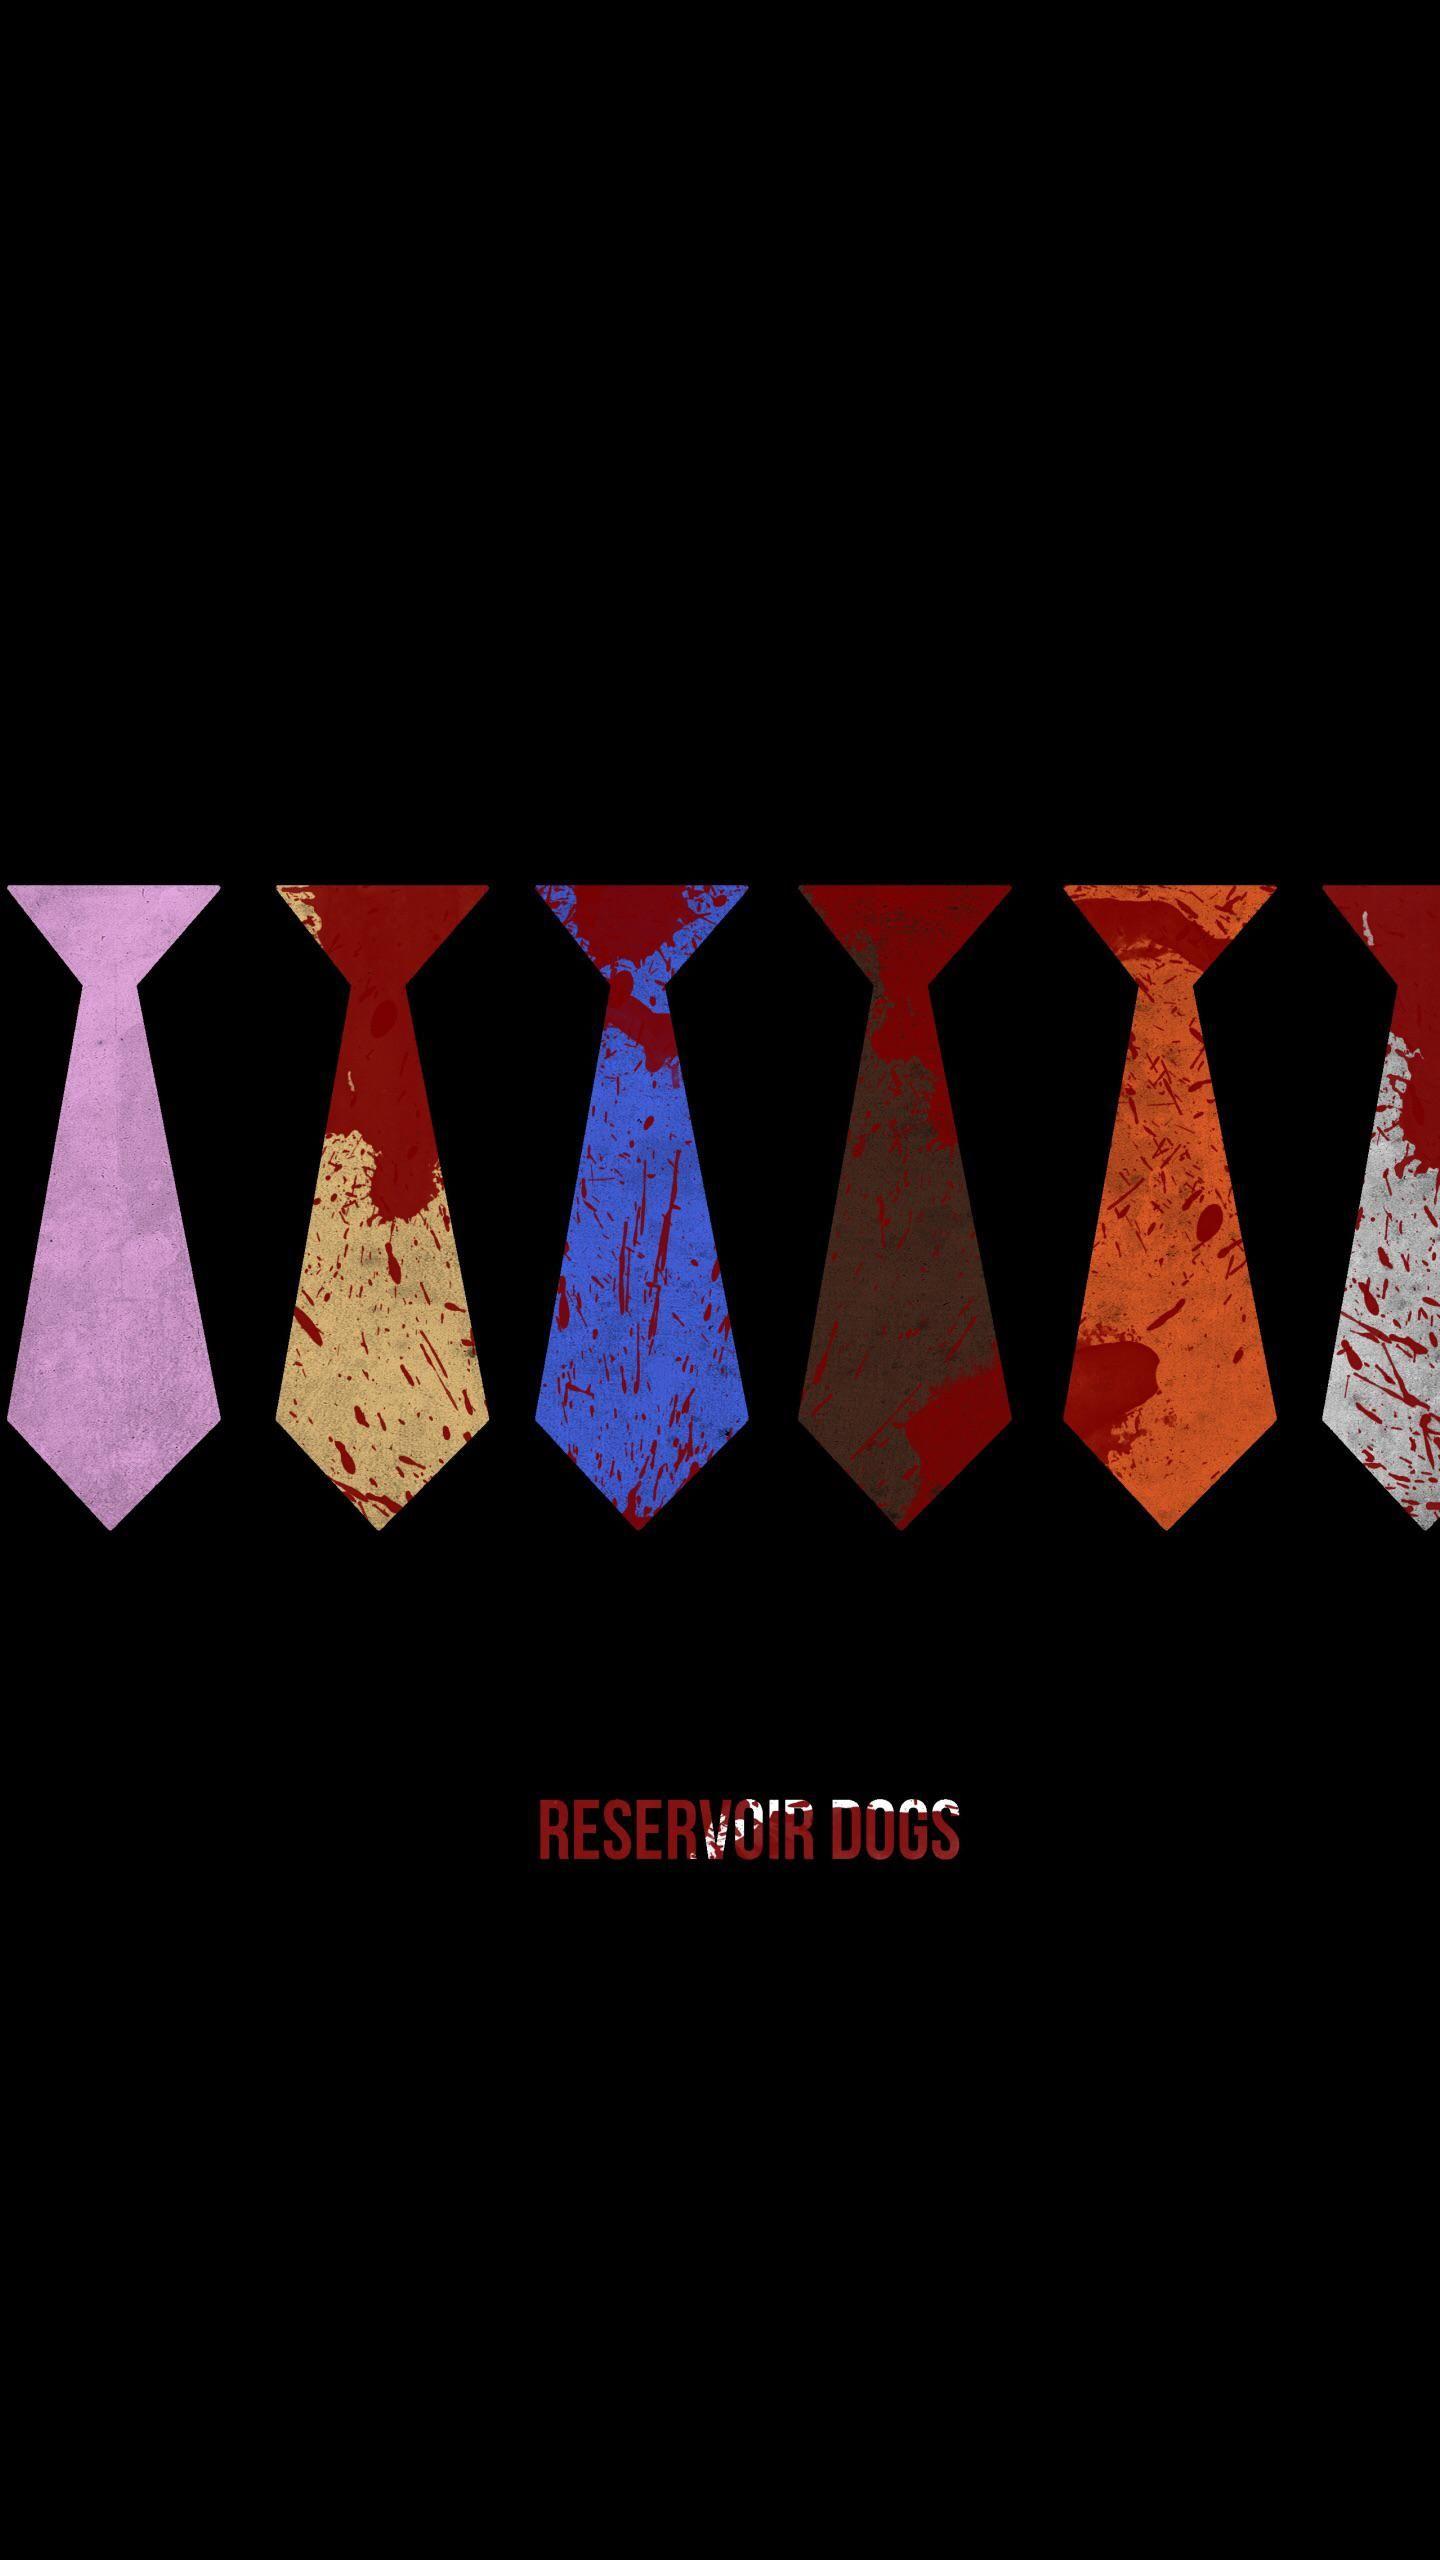 Reservoir Dogs 👌🏼